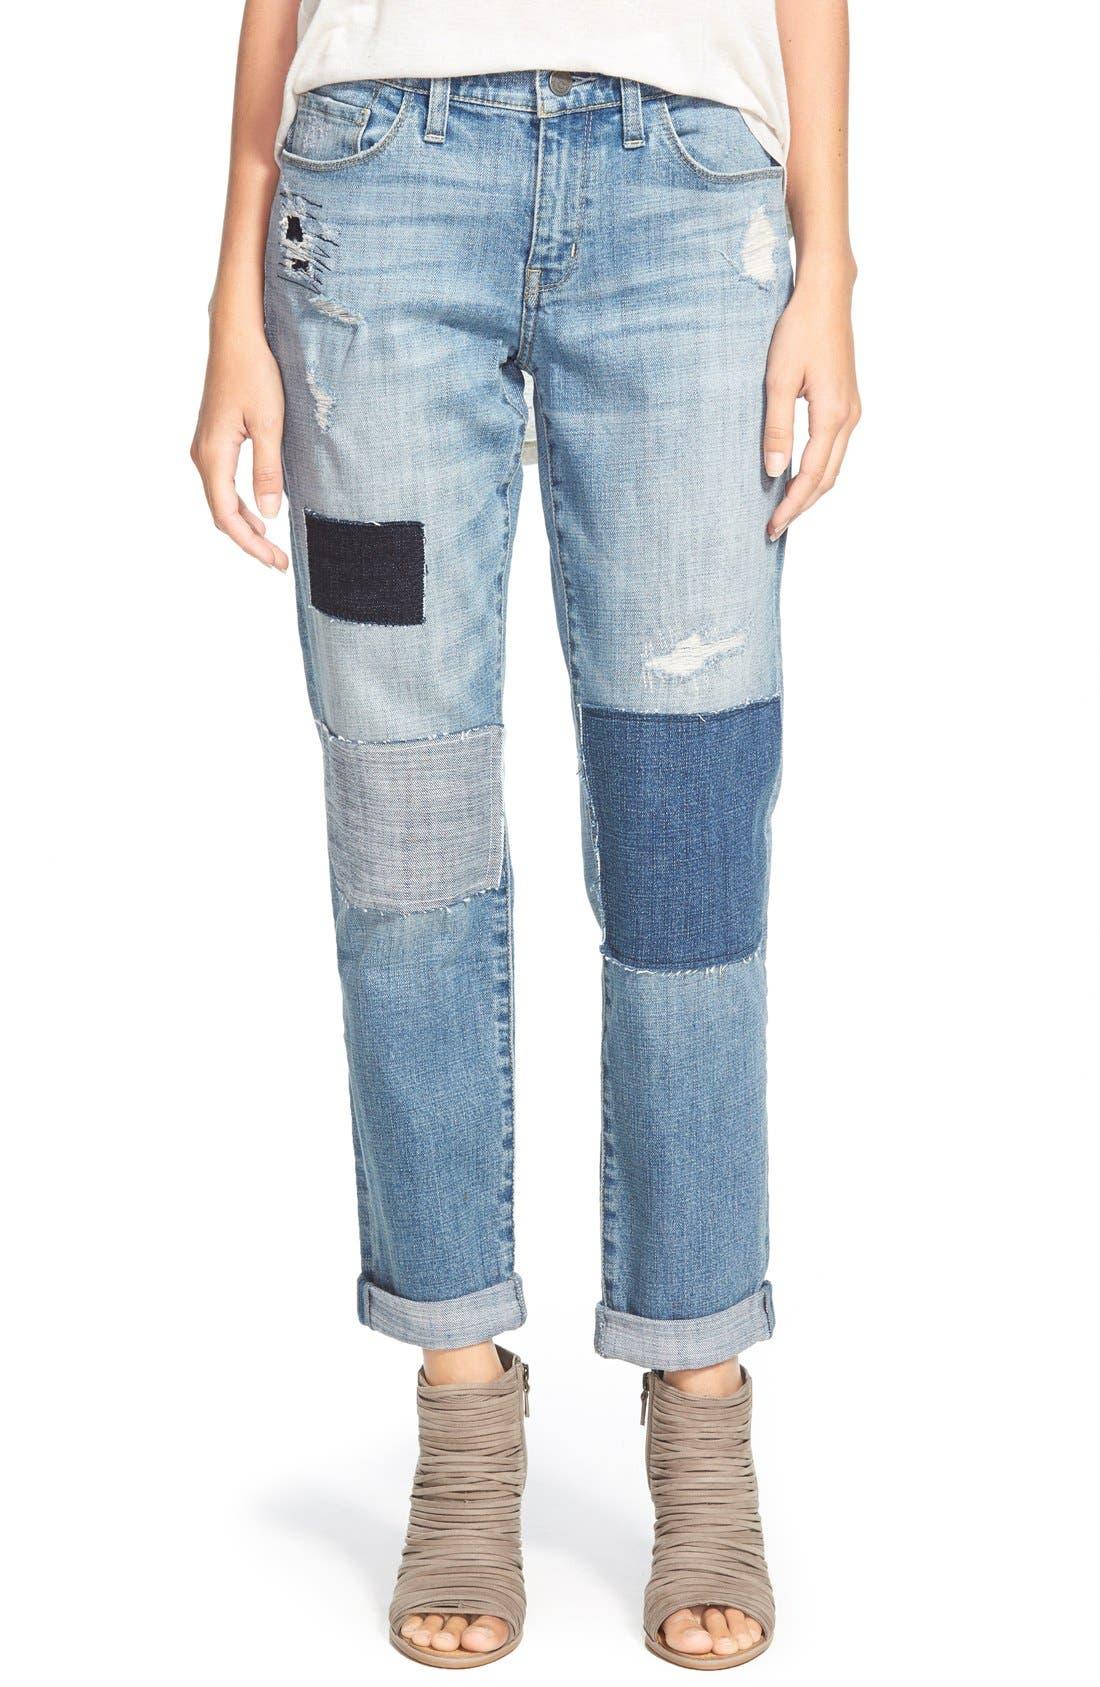 Alternate Image 1 Selected - Treasure&Bond Boyfriend Jeans (Rustic Light Patched)